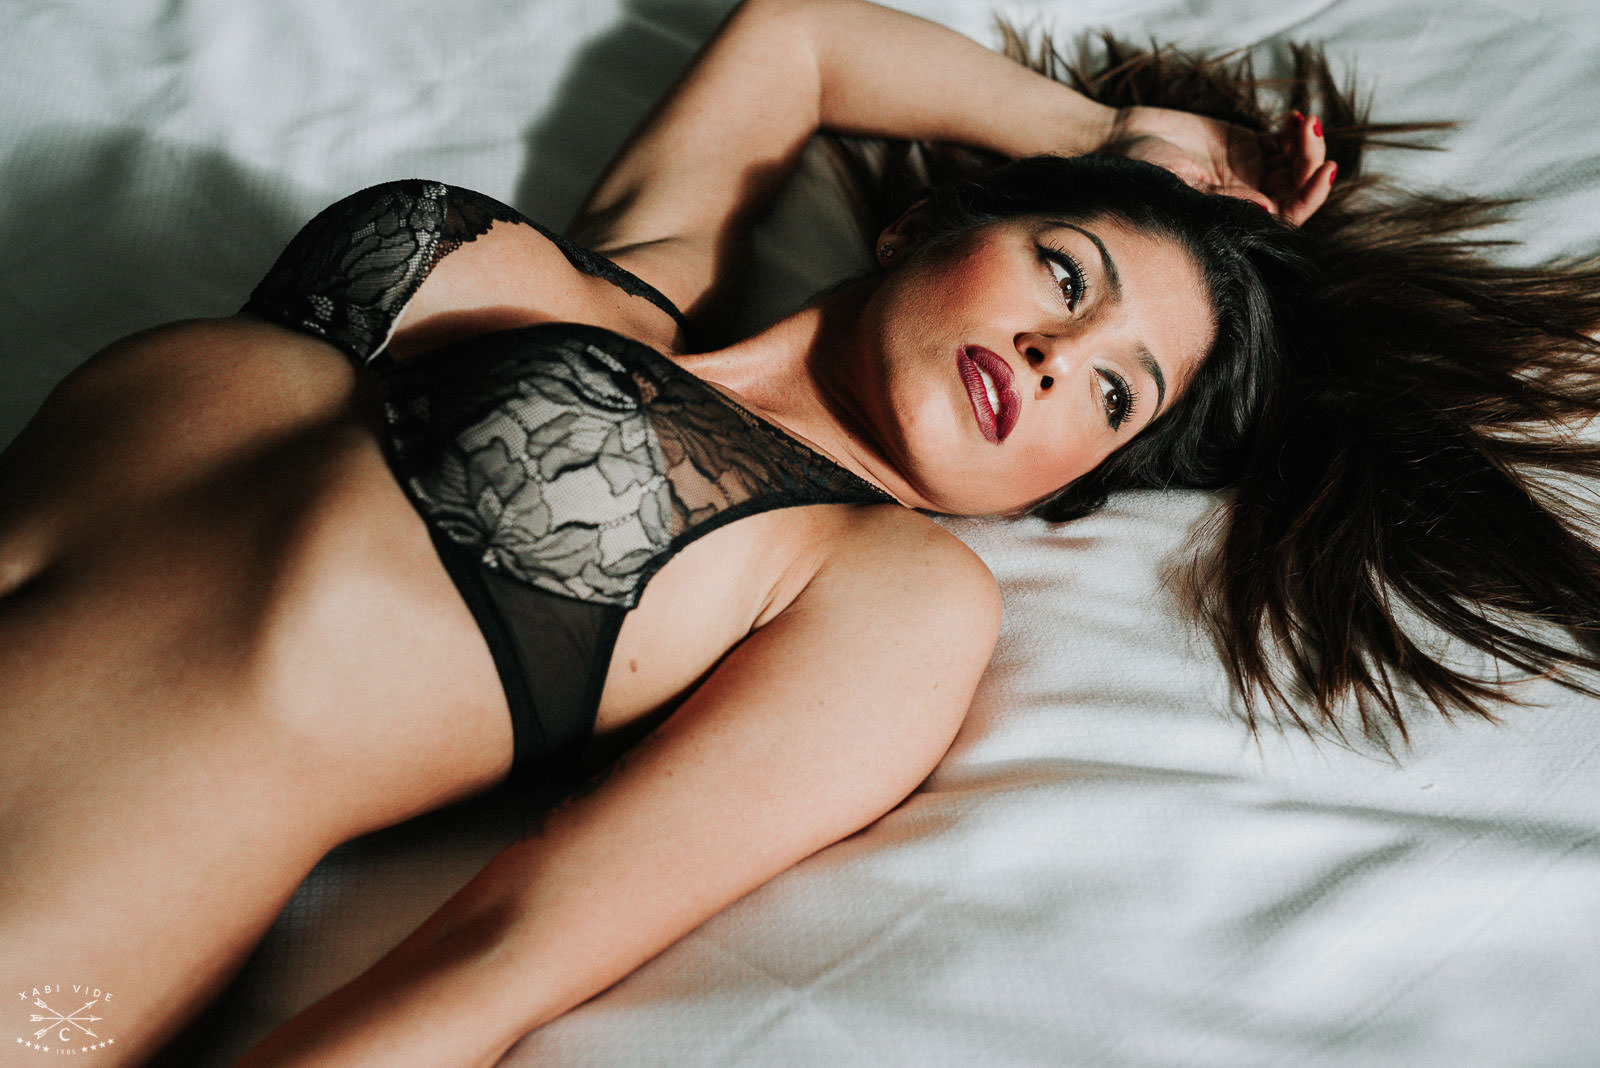 fotografía boudoir-8